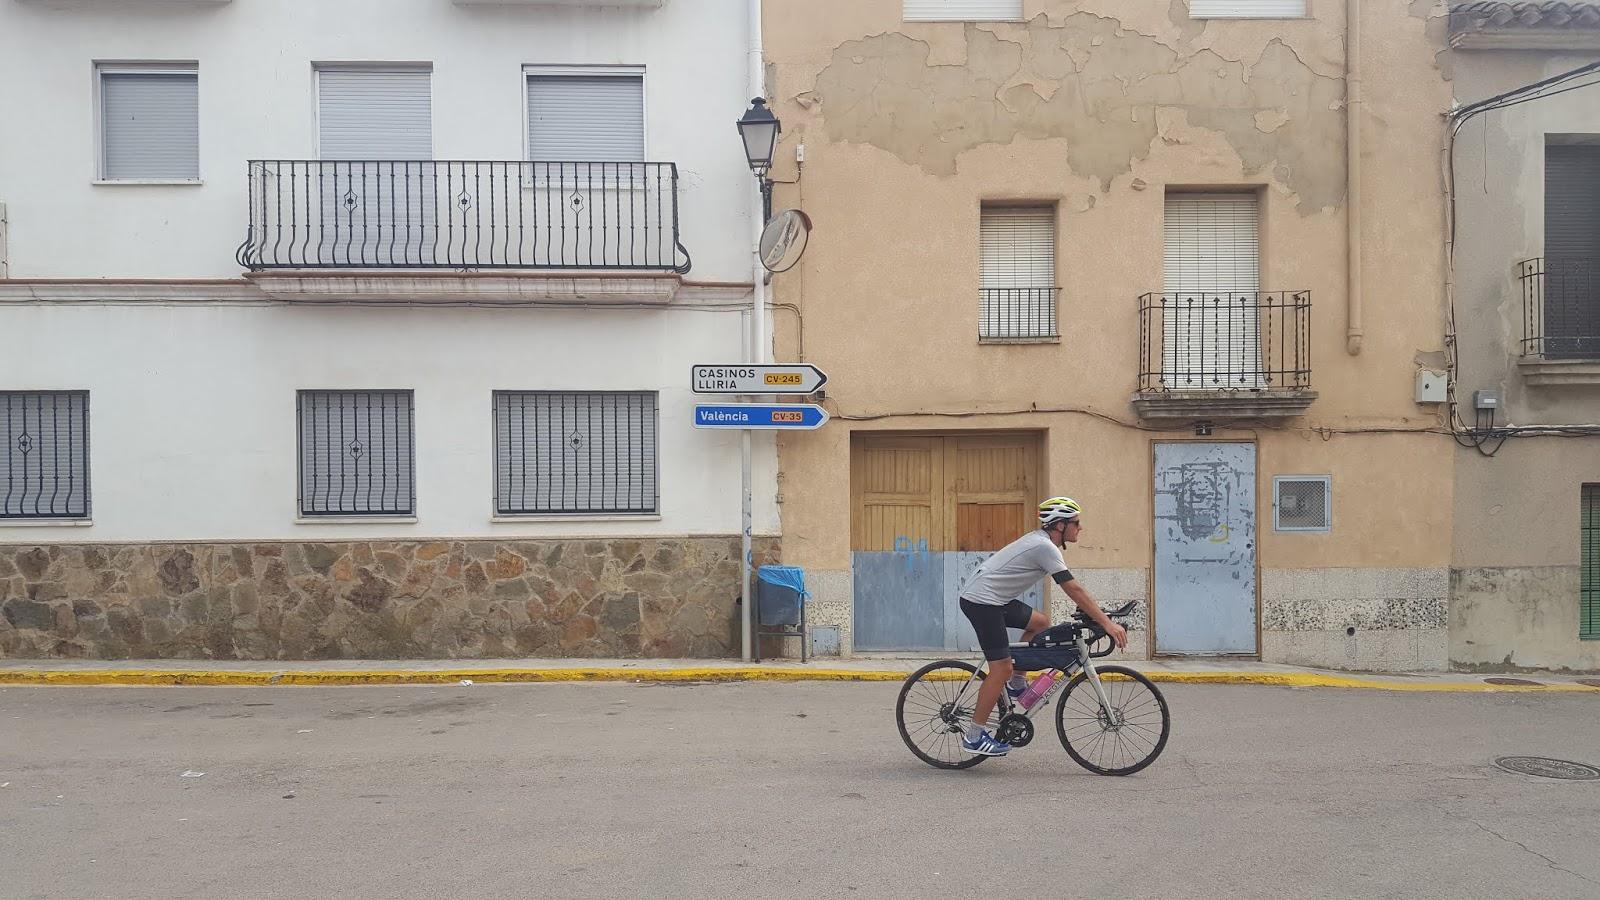 Cycling in Valencia - onyour.bike